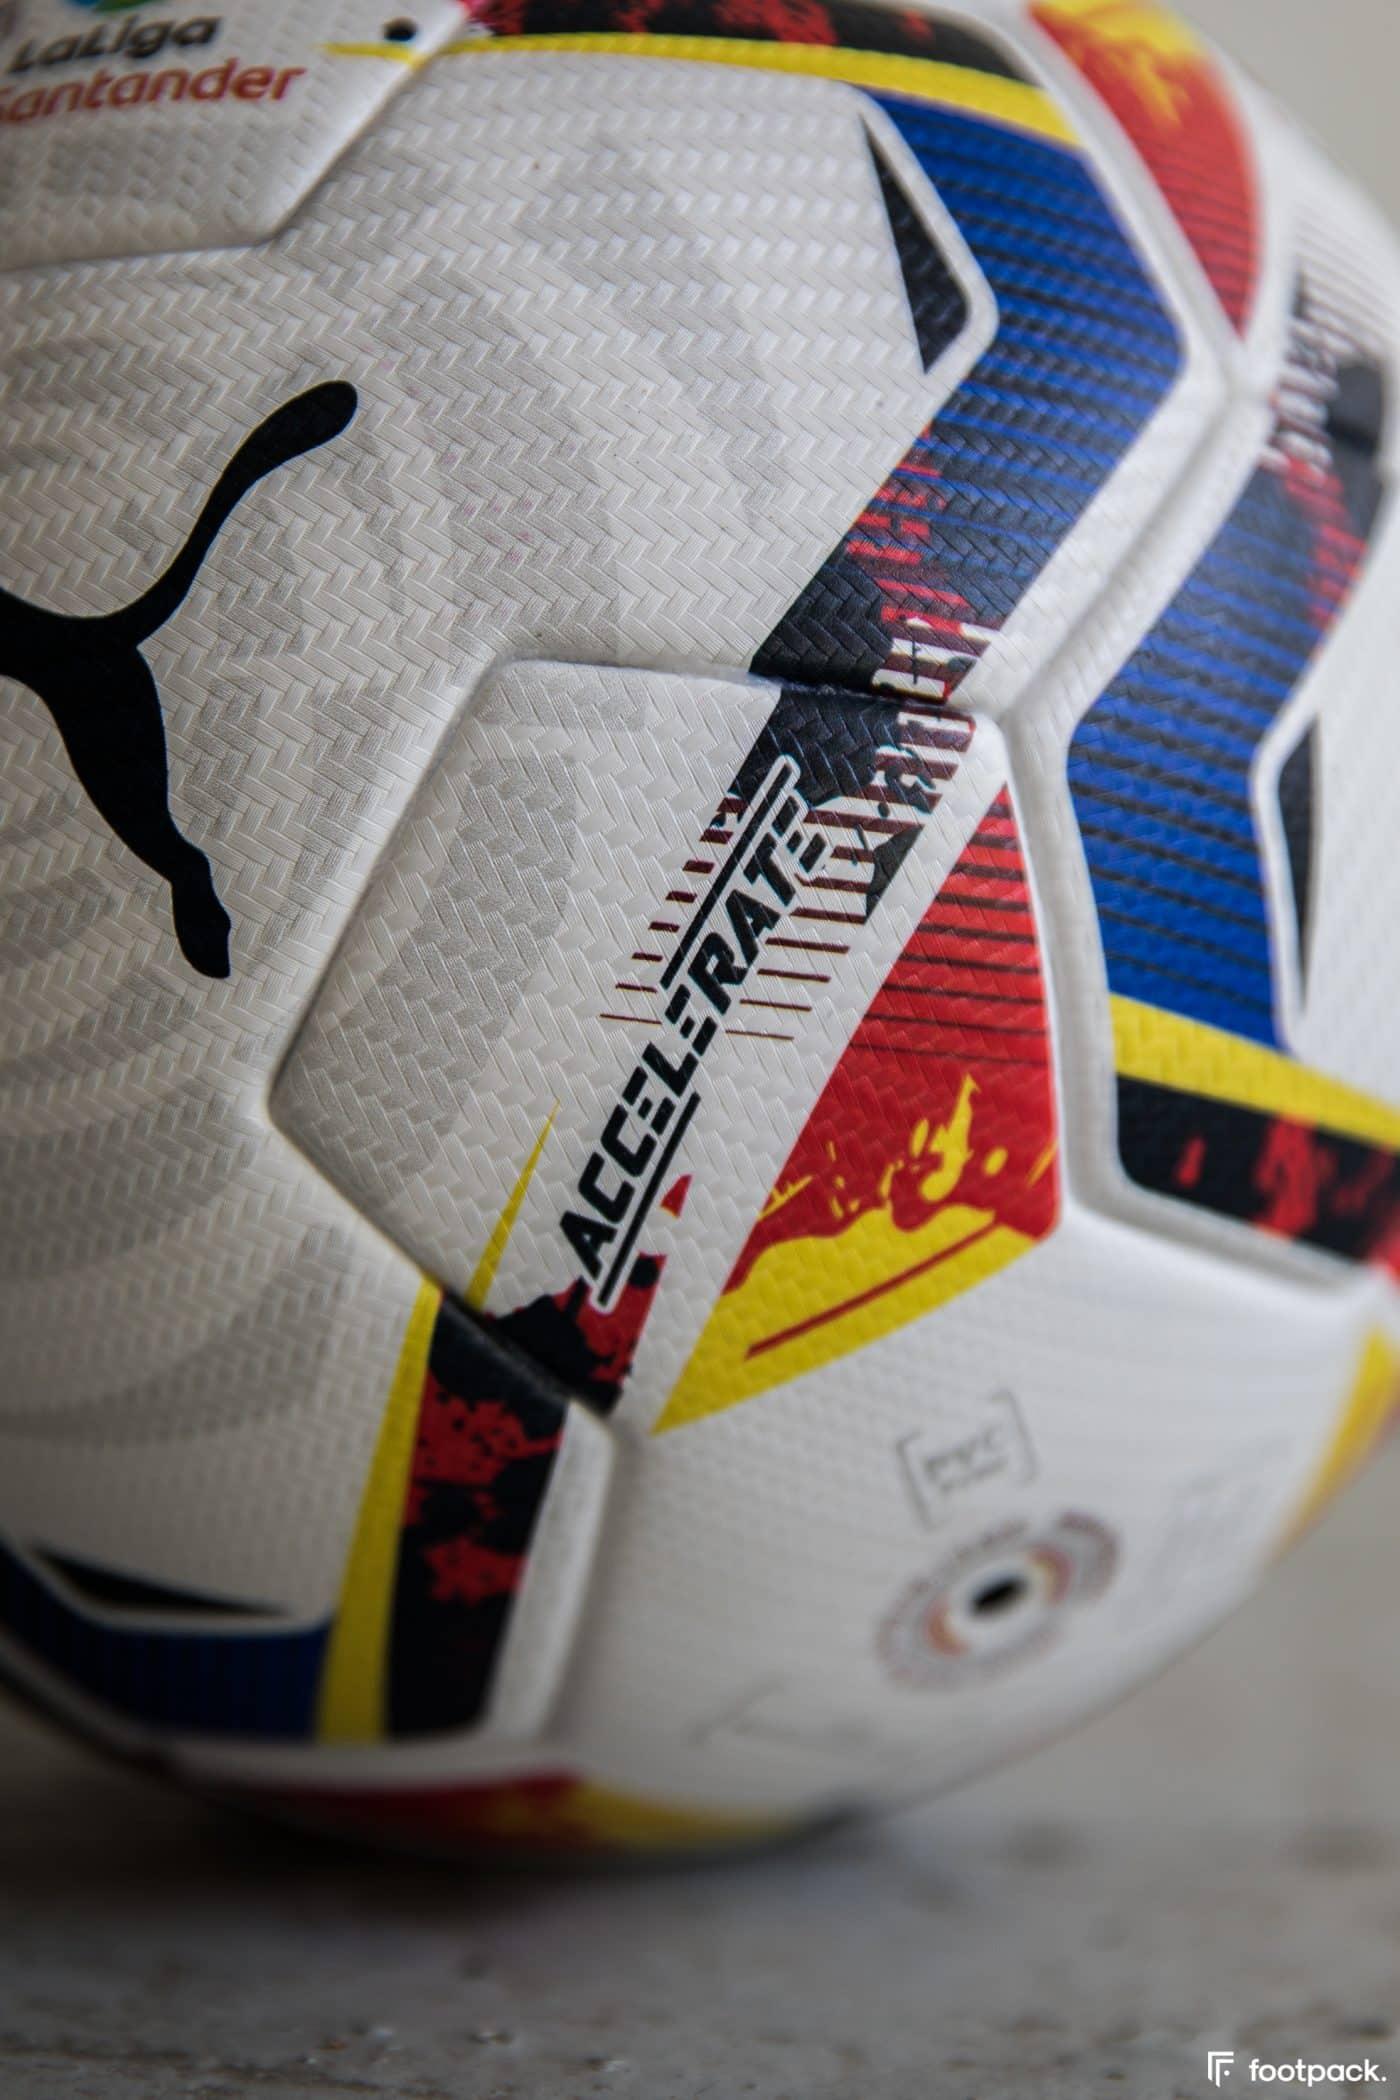 ballon-championnat-espagne-la-liga-2020-2021-puma-footpack-8